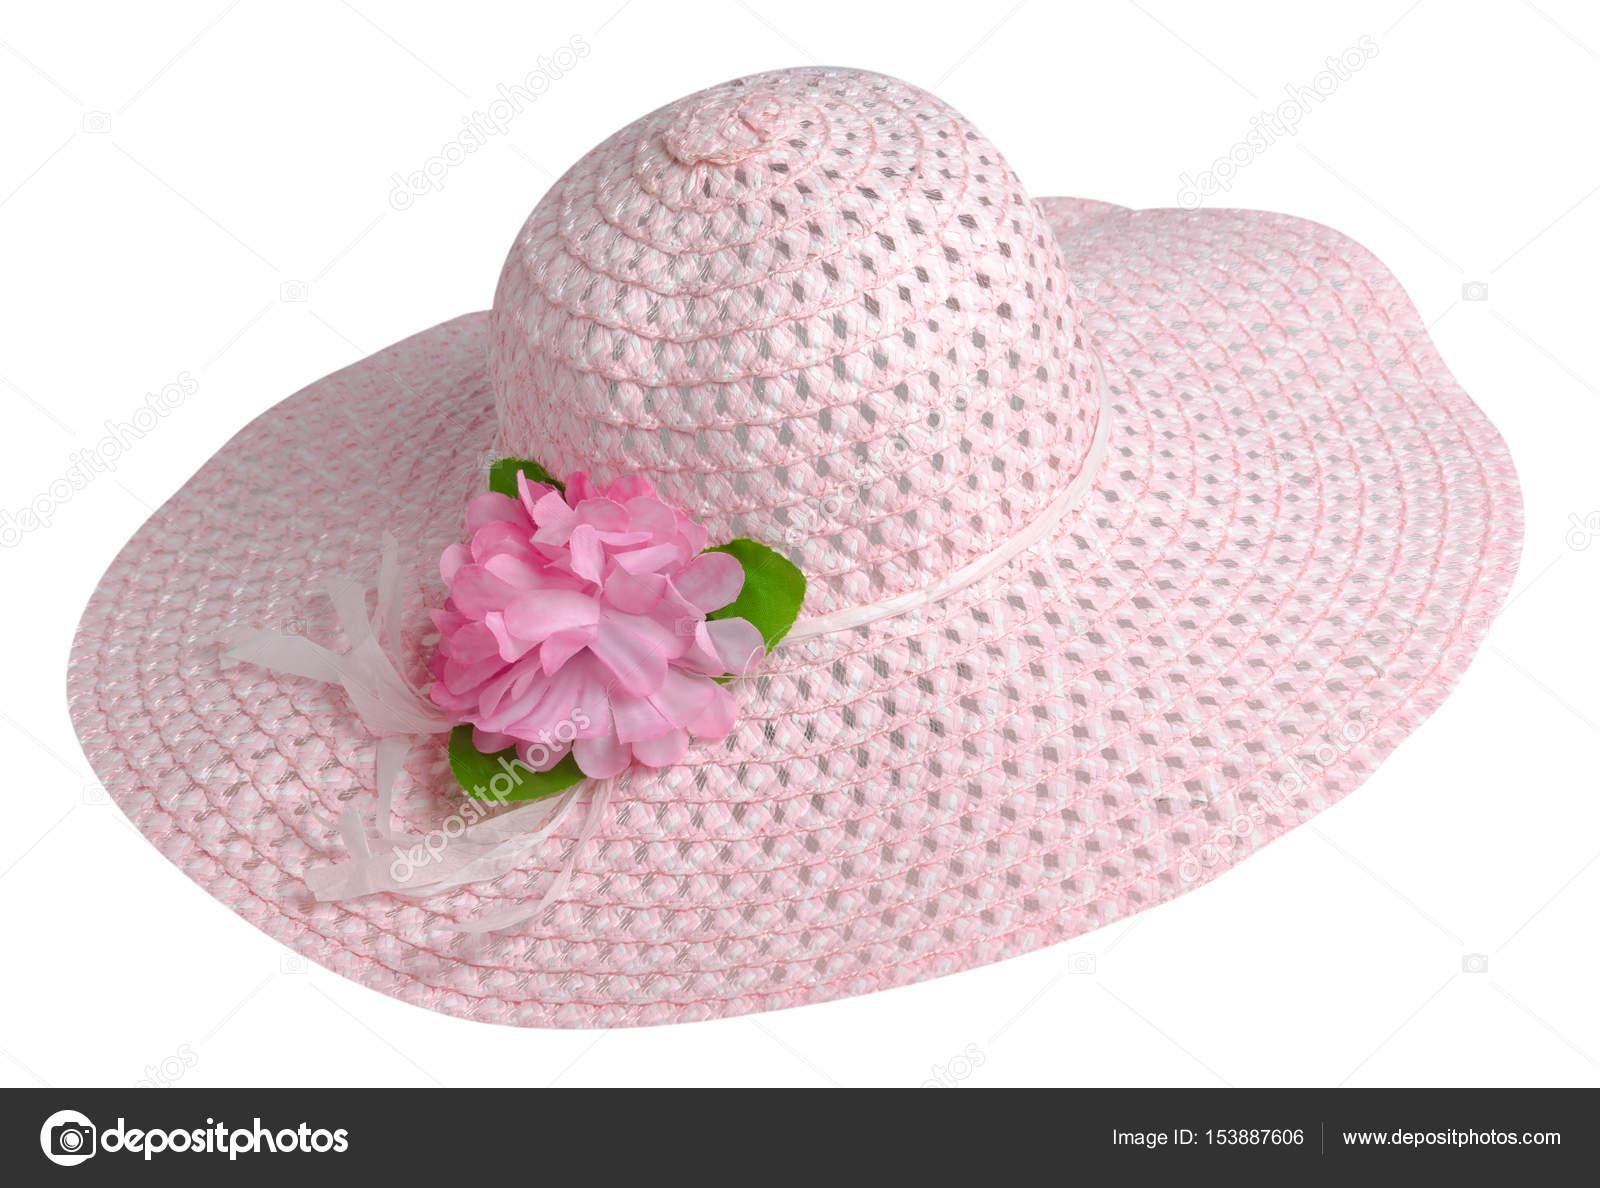 881e97b76e Γυναίκα καπέλο που απομονώνονται σε λευκό φόντο. Παραλία καπέλο των γυναικών.  ροζ καπέλο — Εικόνα από ...